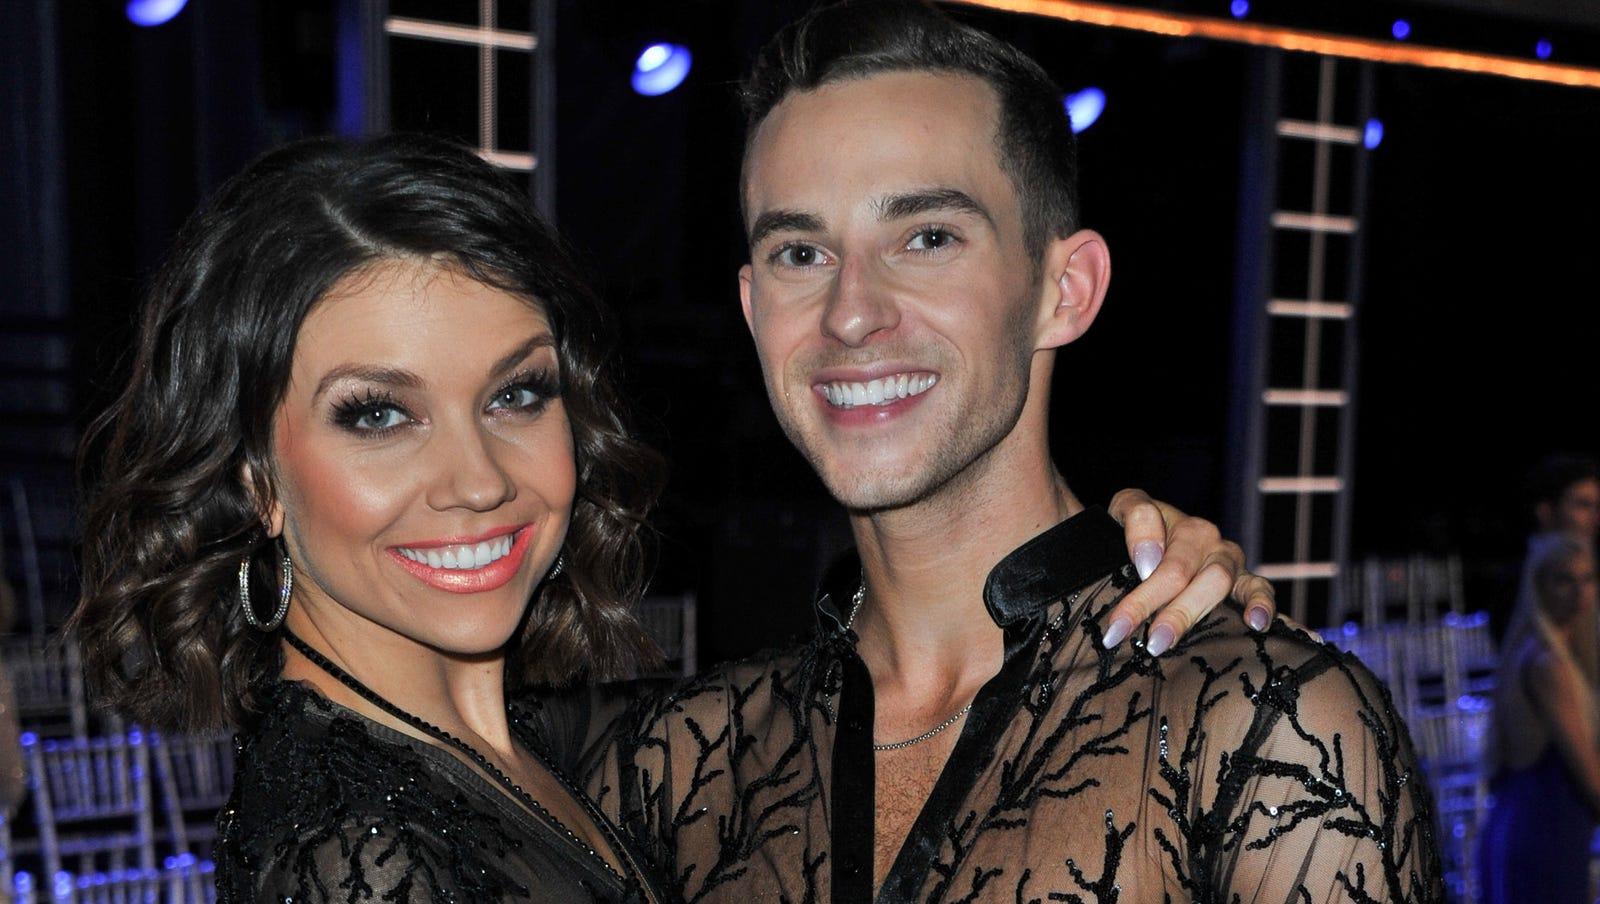 Adam Rippon Beats Tonya Harding Josh Norman In Dancing With The Stars